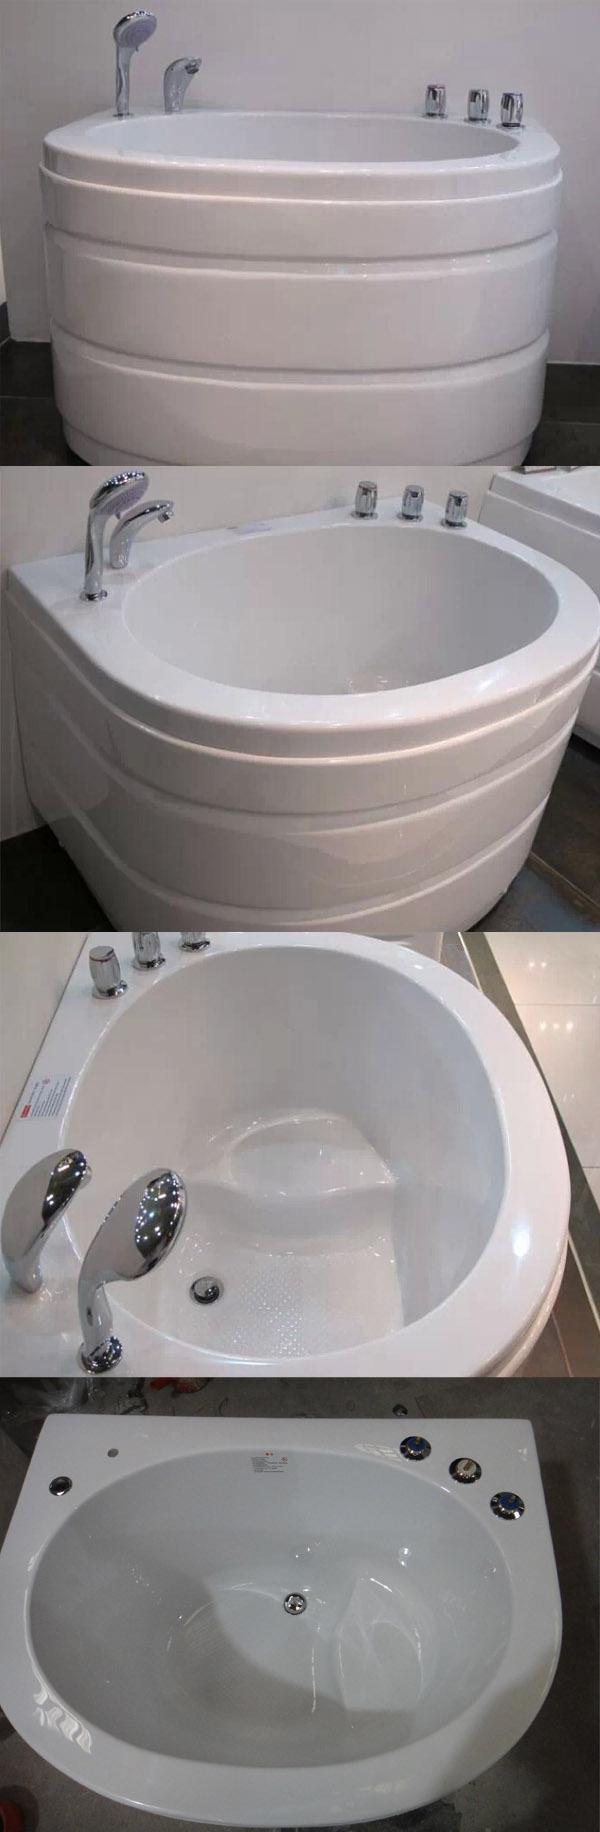 hs b02 bathroom small soaking bath tub kids tub bath tub. Black Bedroom Furniture Sets. Home Design Ideas